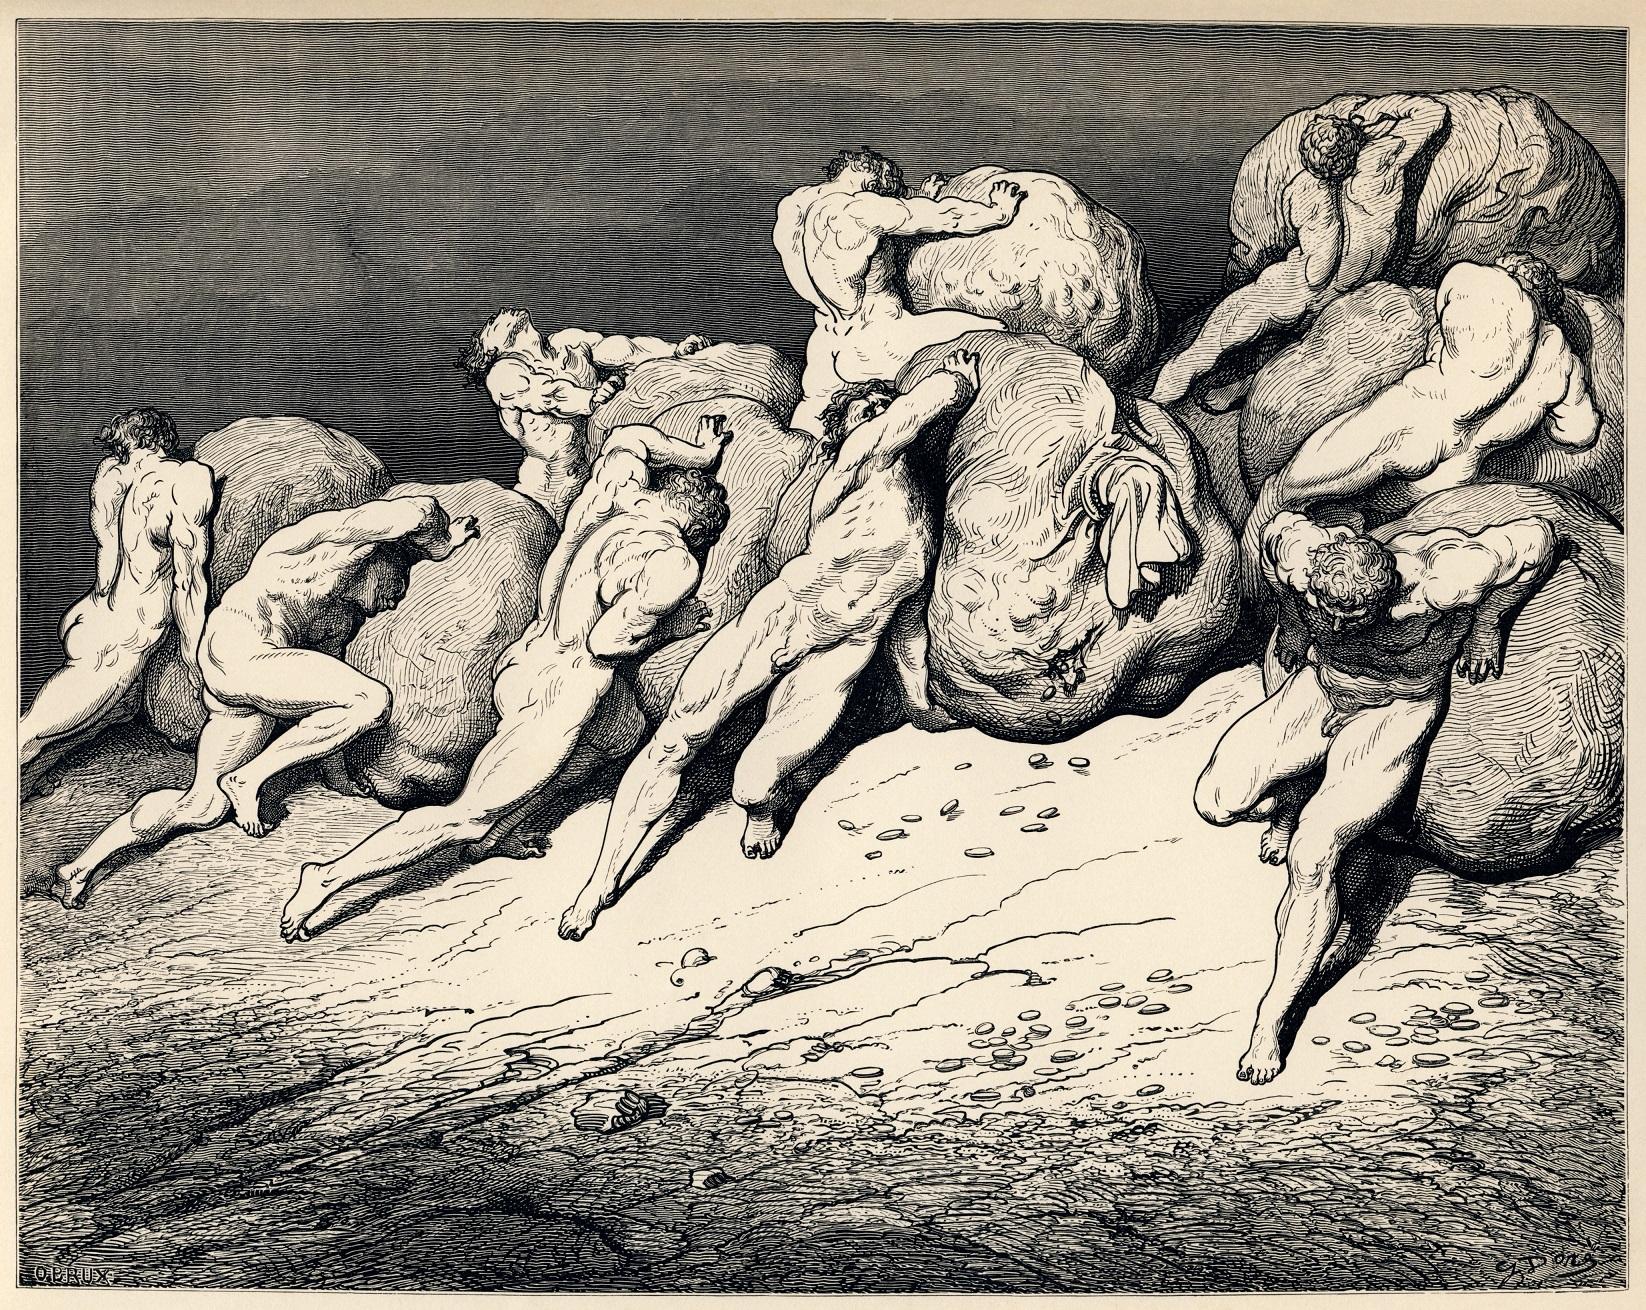 5-gustave-dore-canto-vii-1857